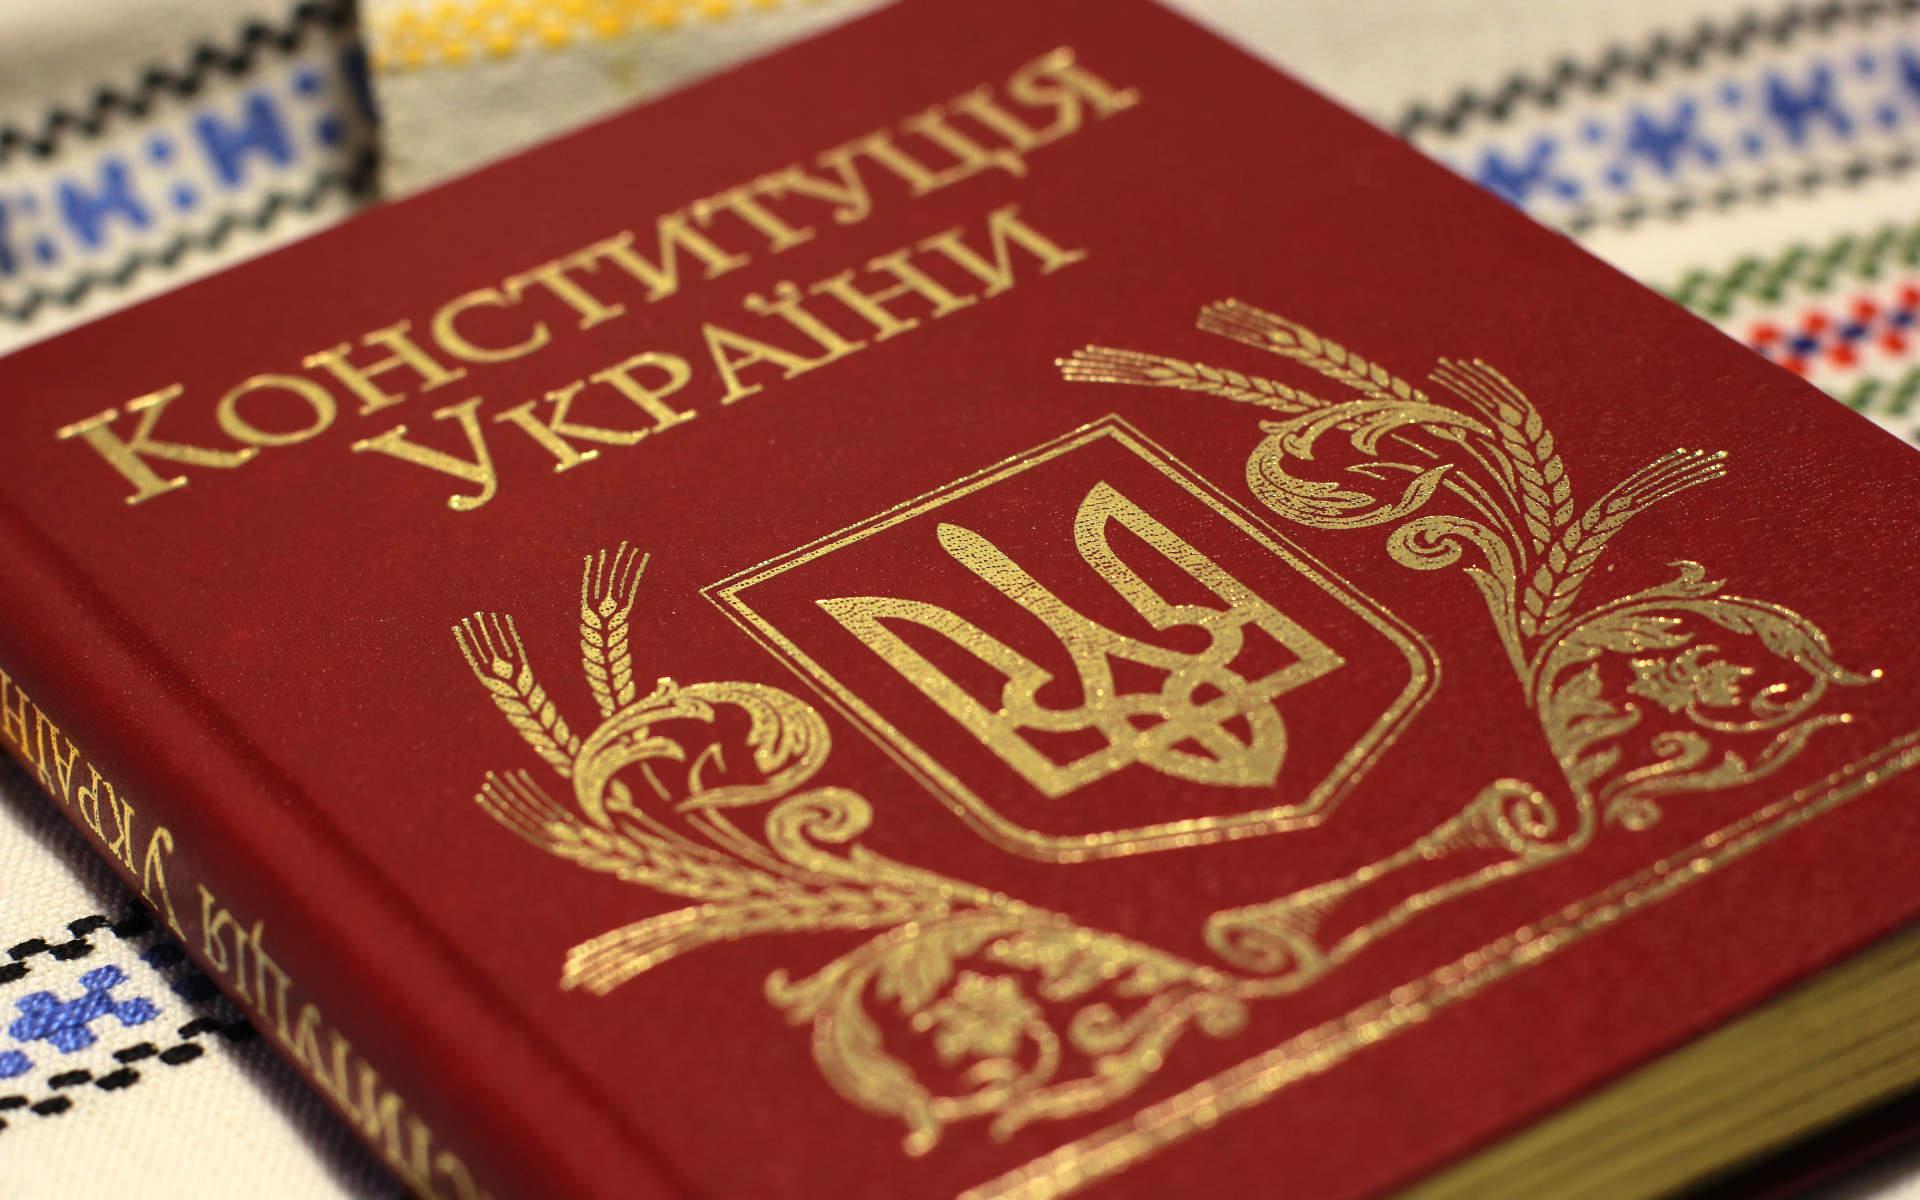 Политтехнологи президента нашли «ПДЧ-заменитель» именно в «закреплении НАТО и ЕС на уровне Конституции»